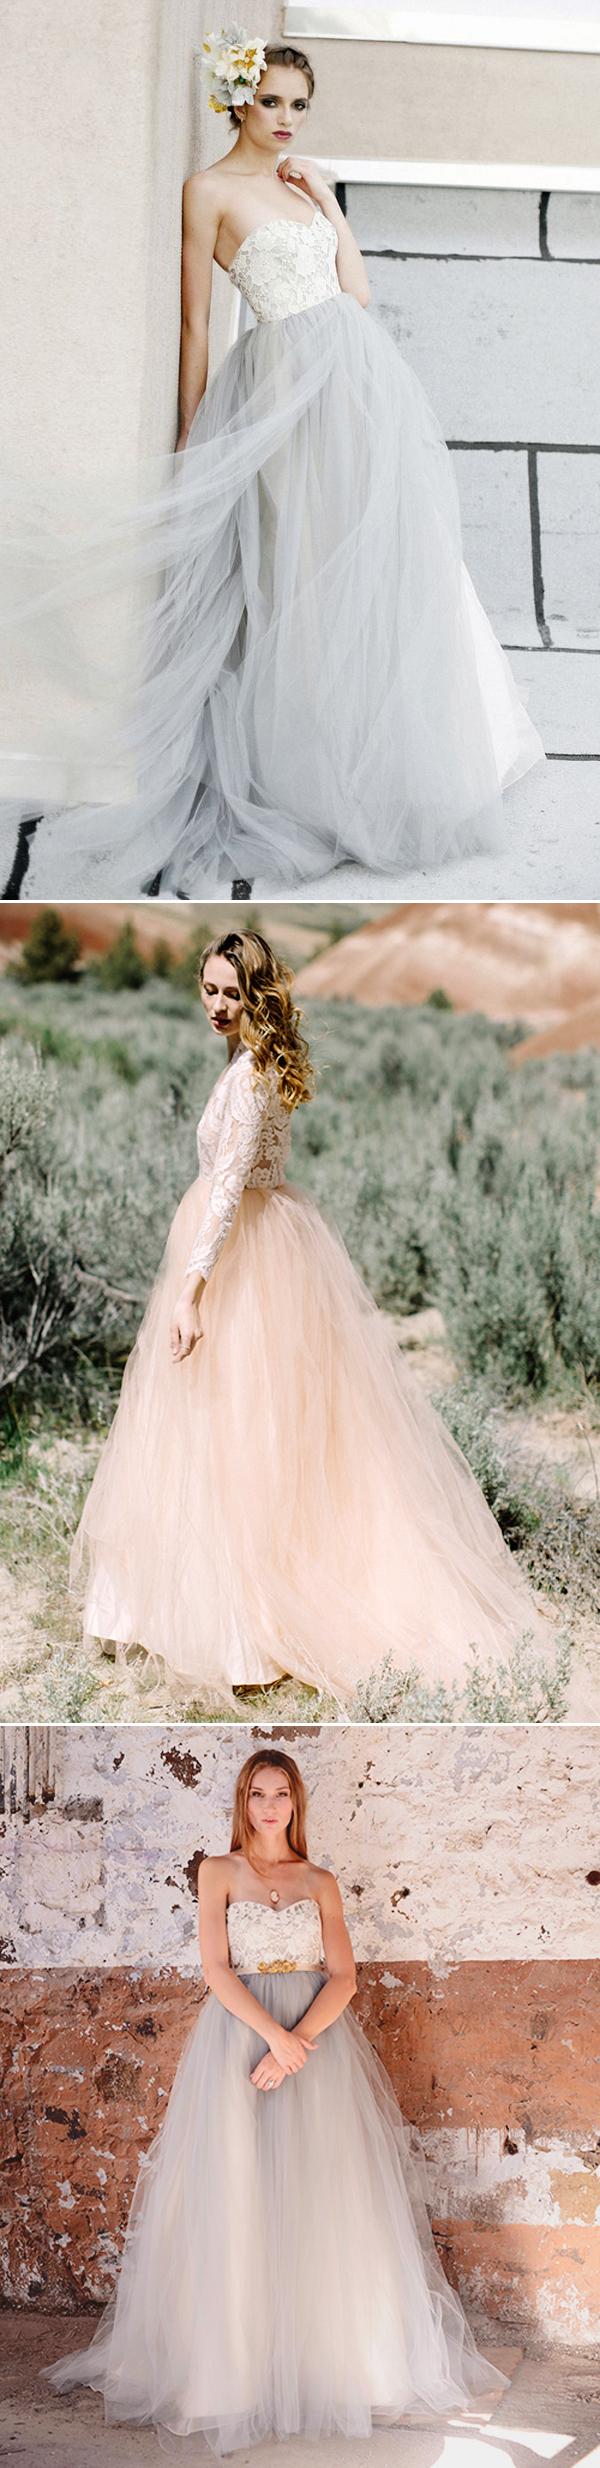 35 Sweet Baby Doll-Inspired Wedding Dresses You\'ll Love! - Praise ...